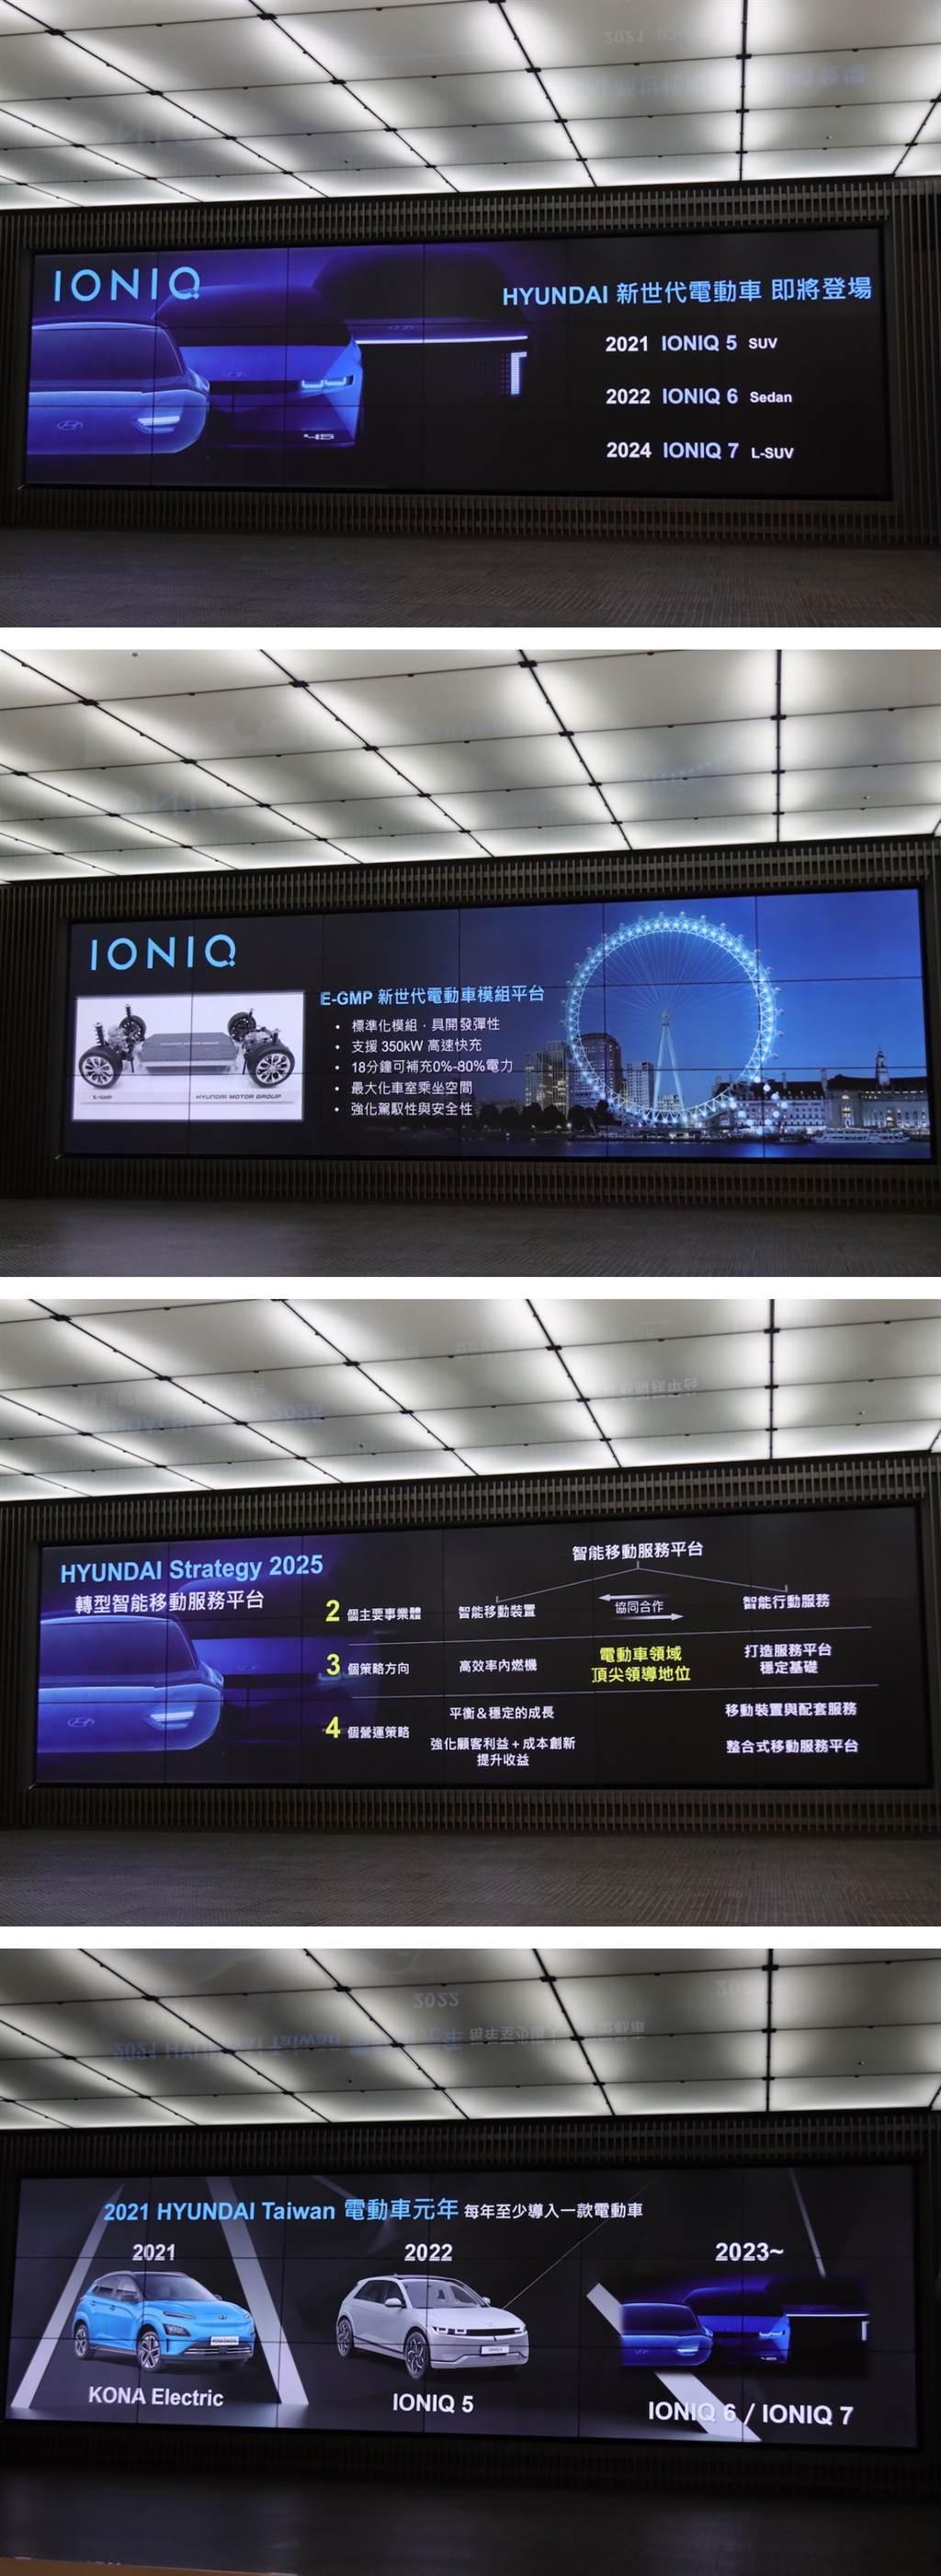 Kona EV打頭陣 Hyundai在台啟動新能源車佈局(圖/CarStuff)